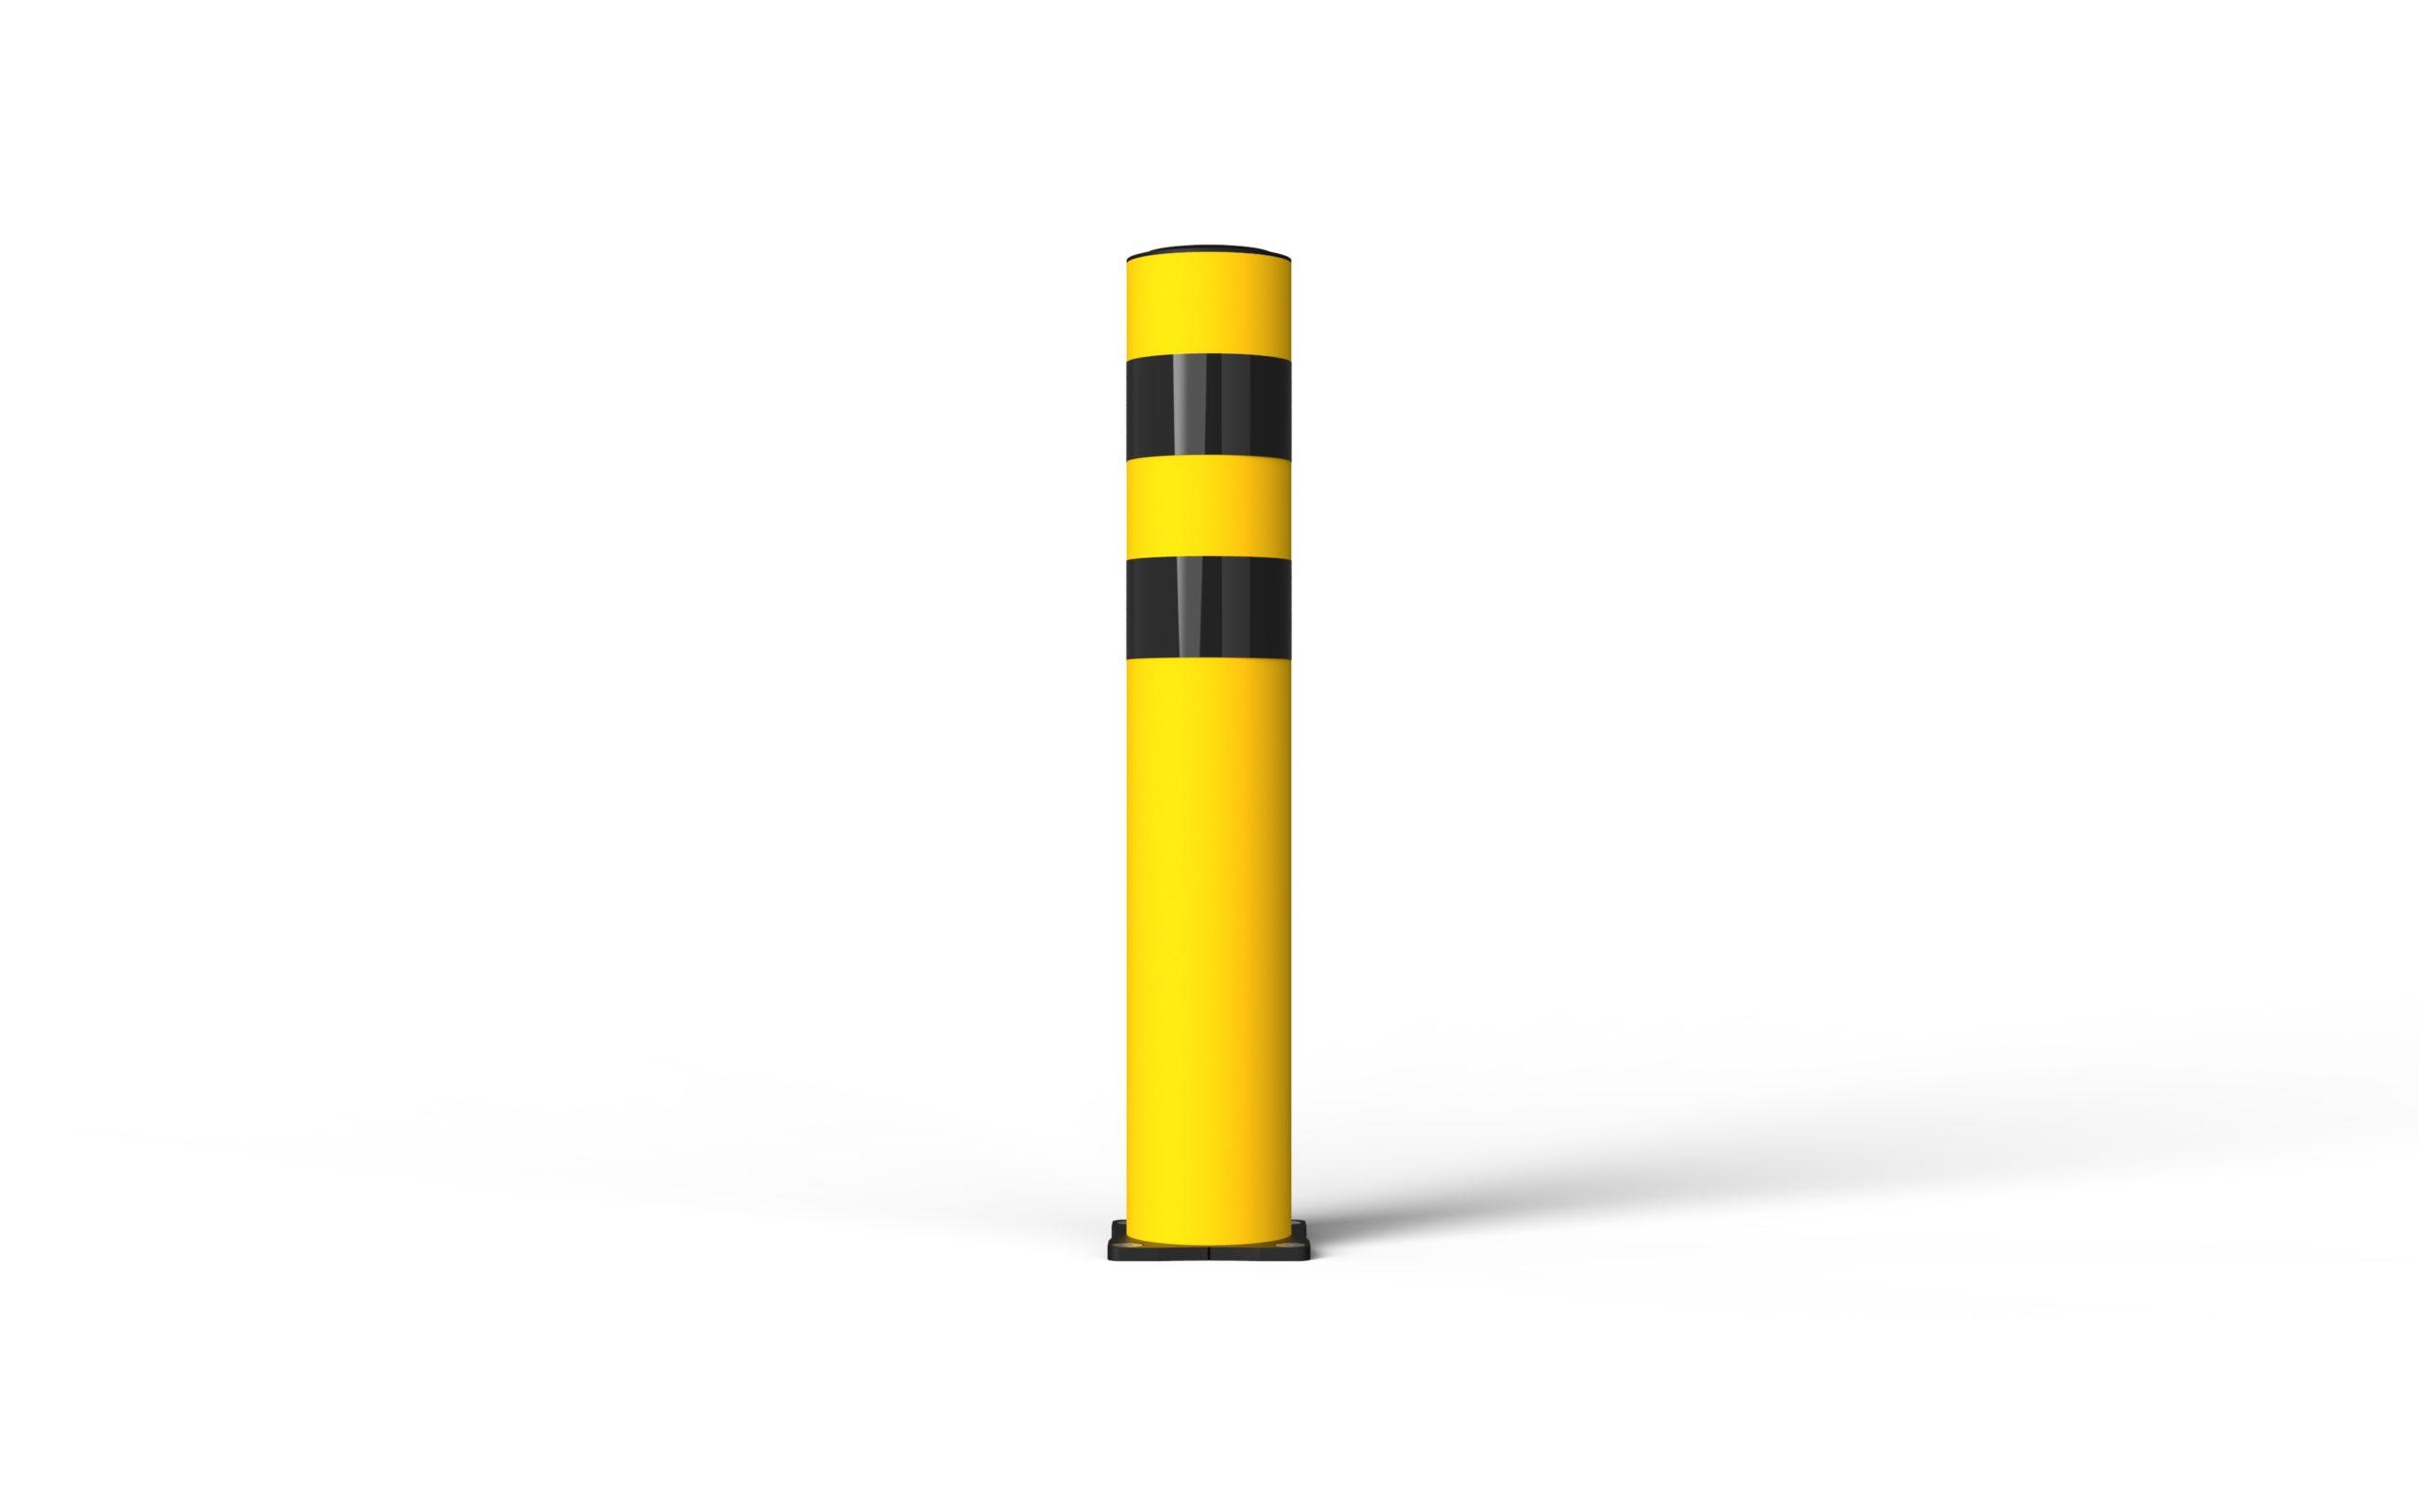 Schutzpoller boplan® BO Light Ø125 – Höhe 750 mm – gelb – verzinkte Bodenplatte